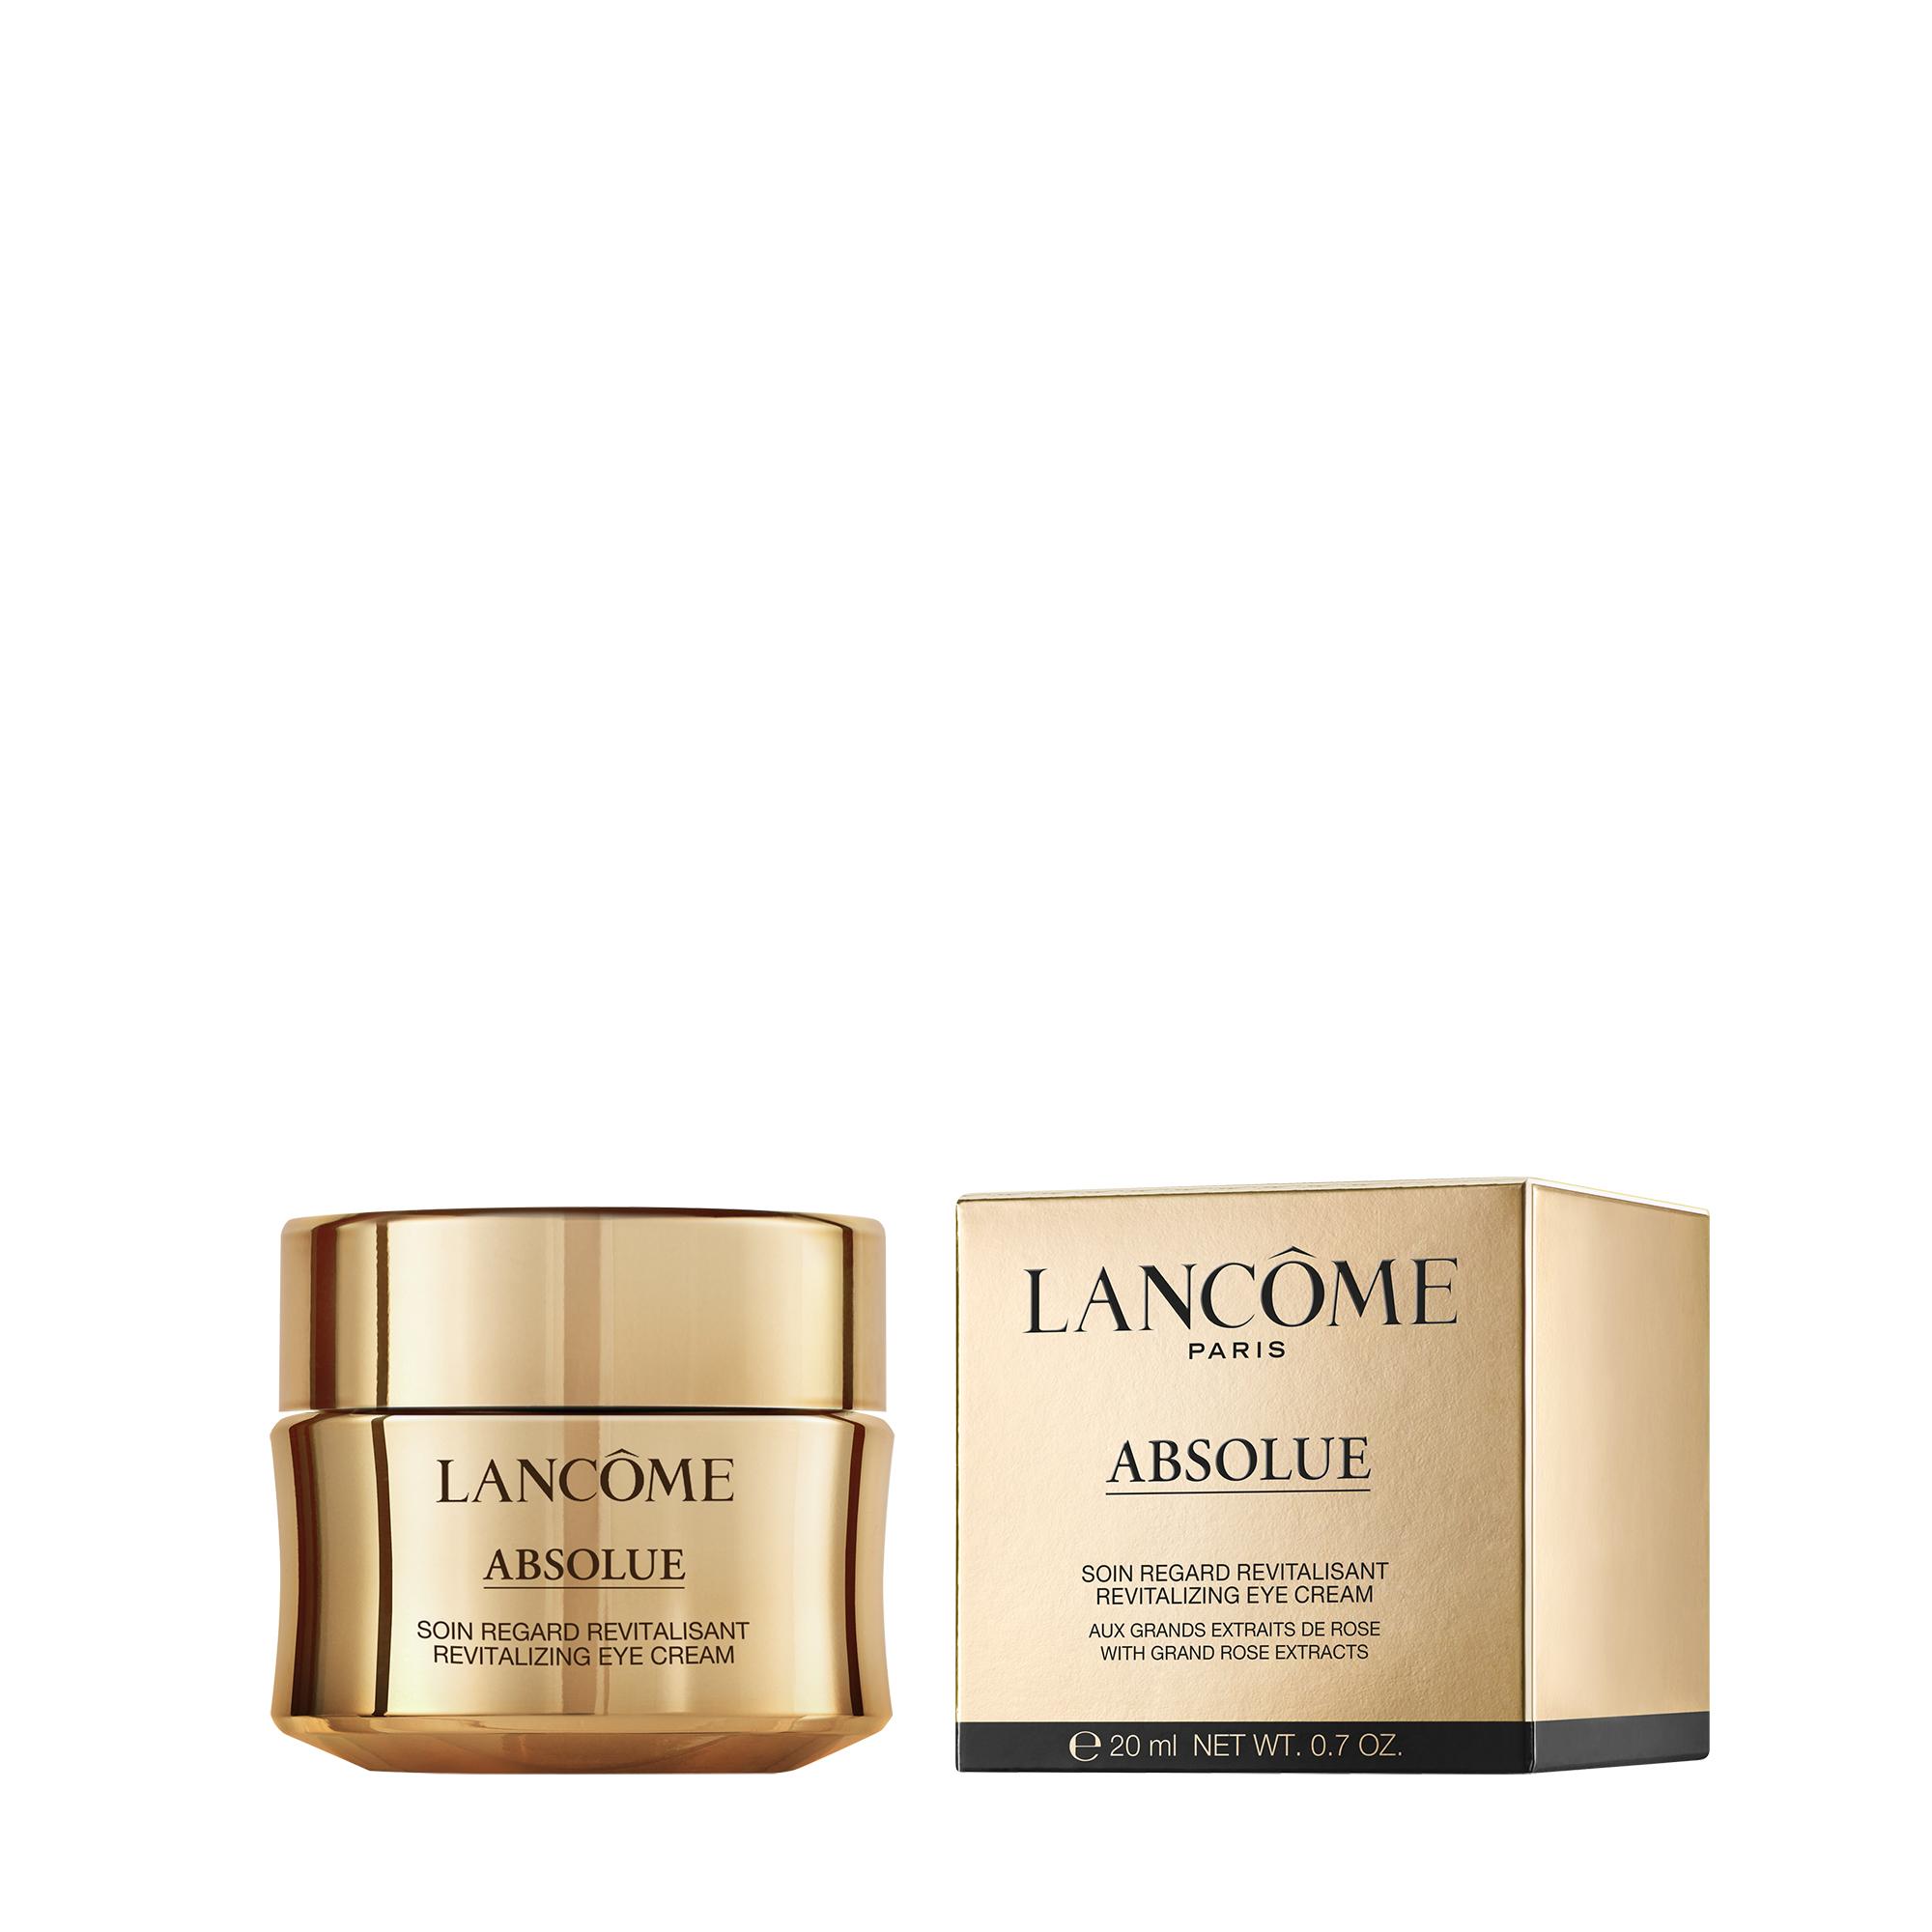 Lancôme Absolue Revitalizing Eye Cream, 20 ml